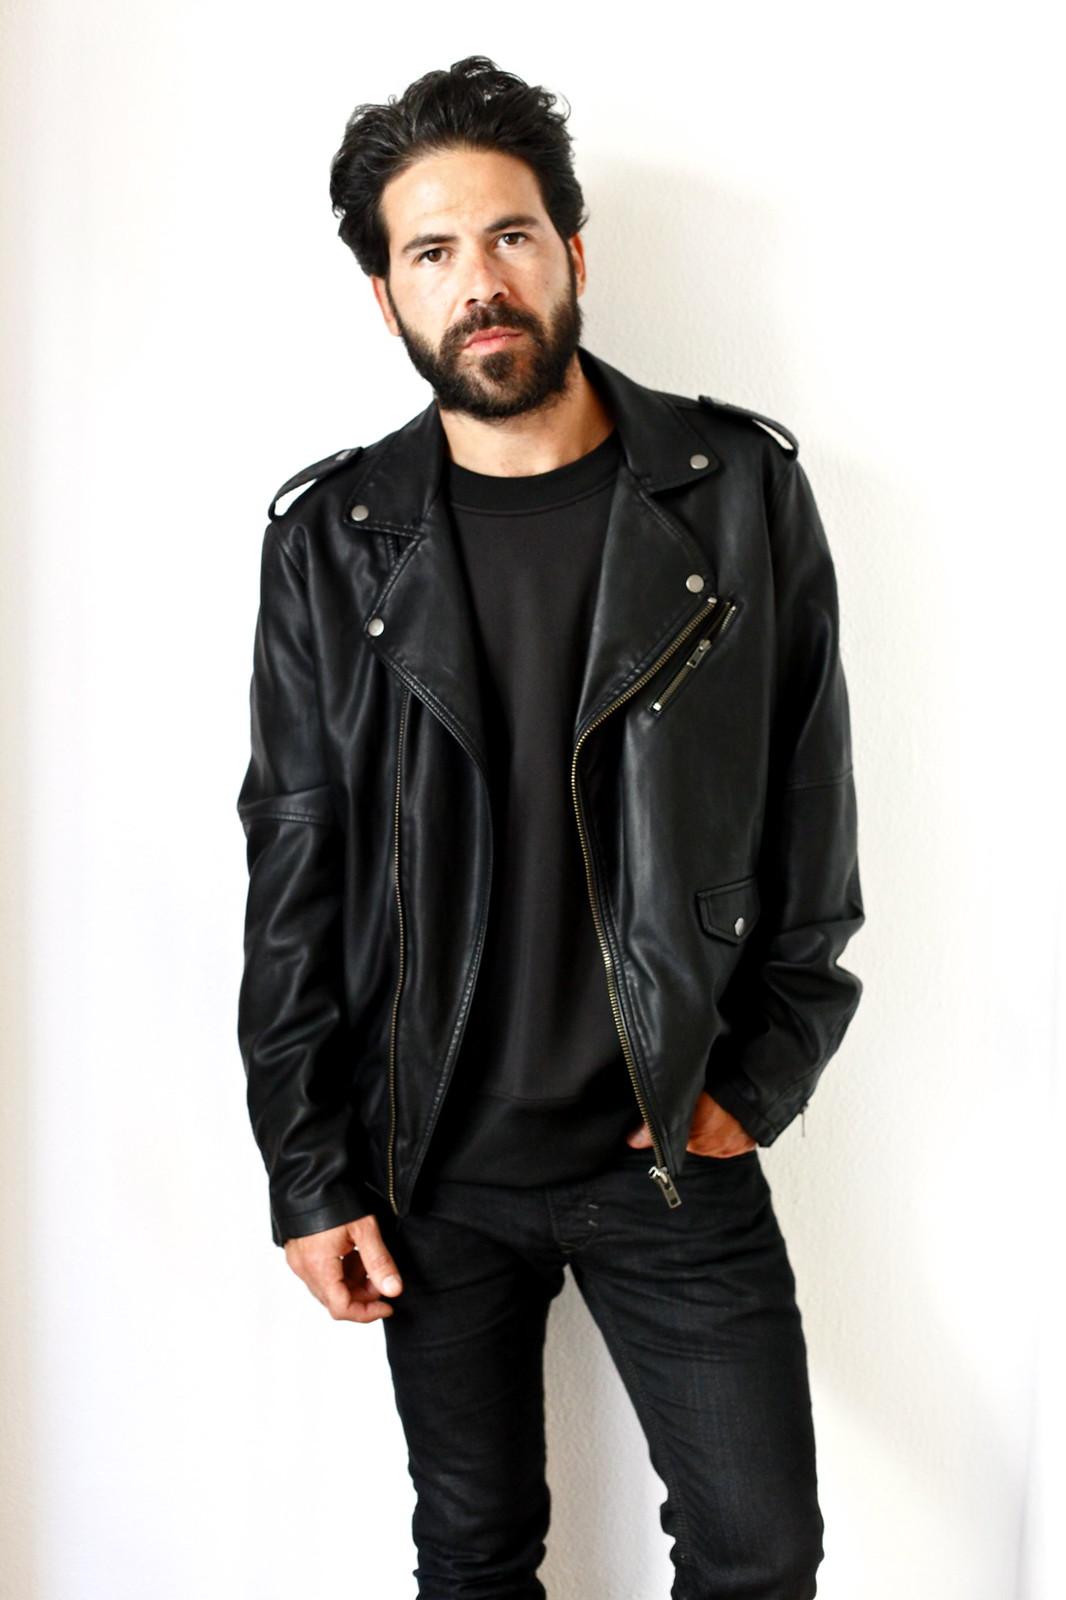 miguel_carrizo_ilcarritzi_look_total_black_